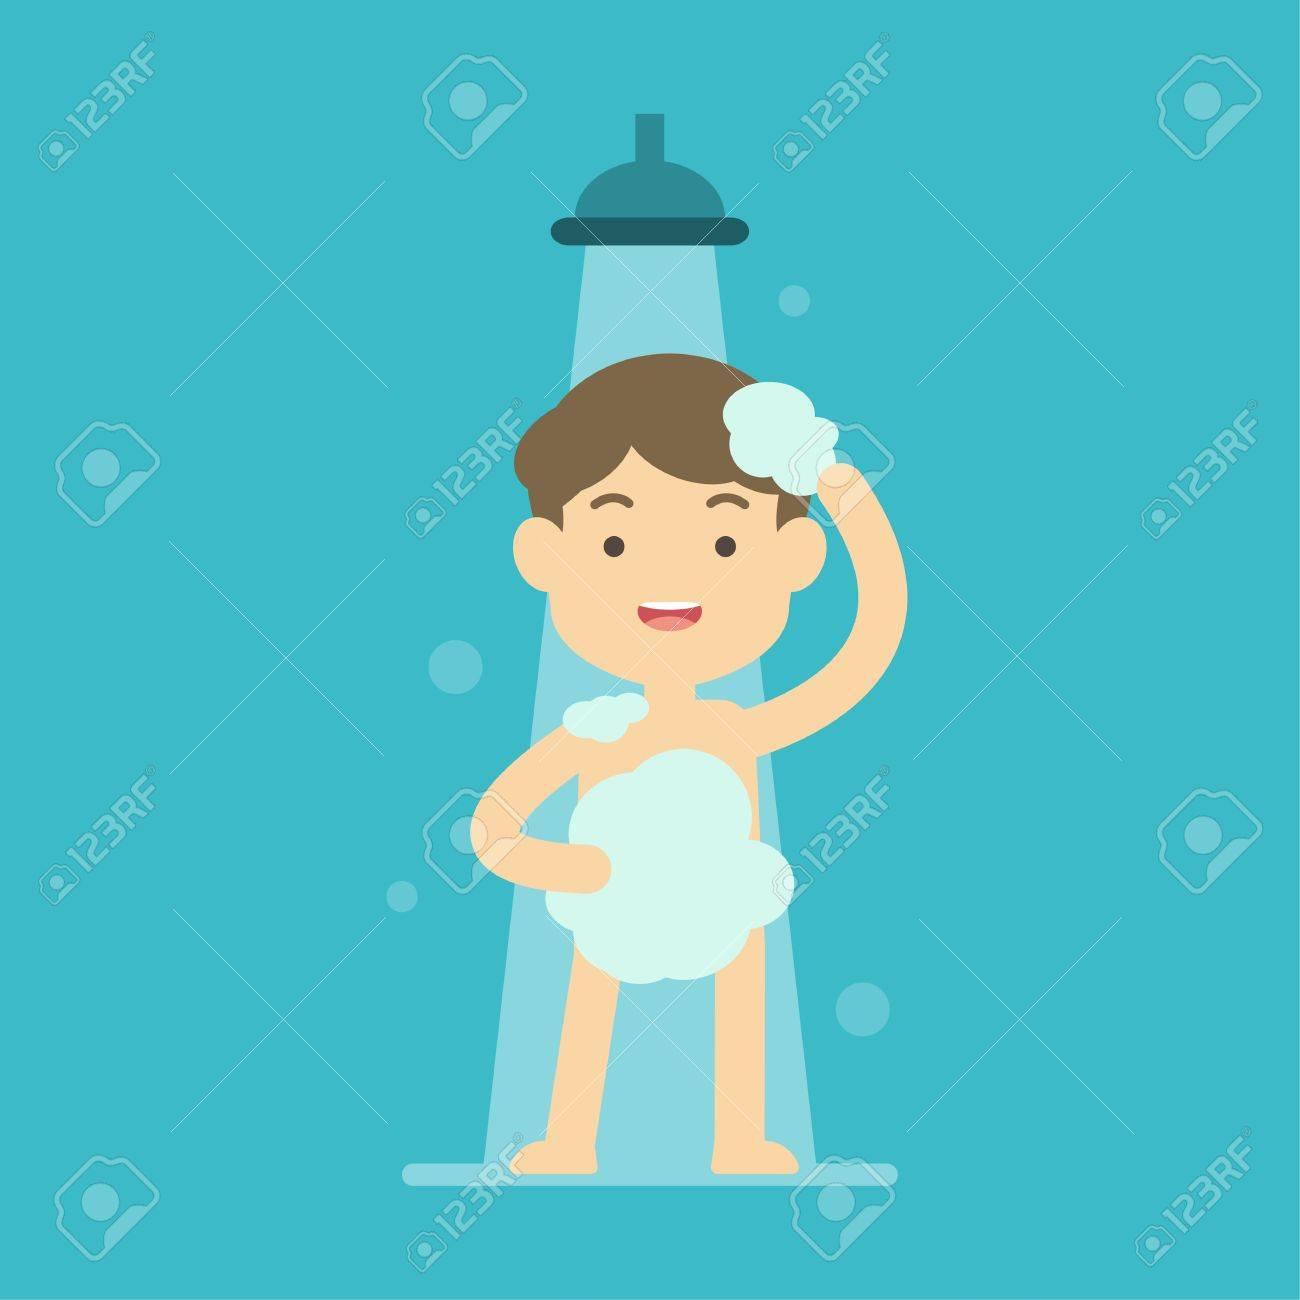 Happy boy taking shower in bathroom concept, Flat vector illustration. - 87441647